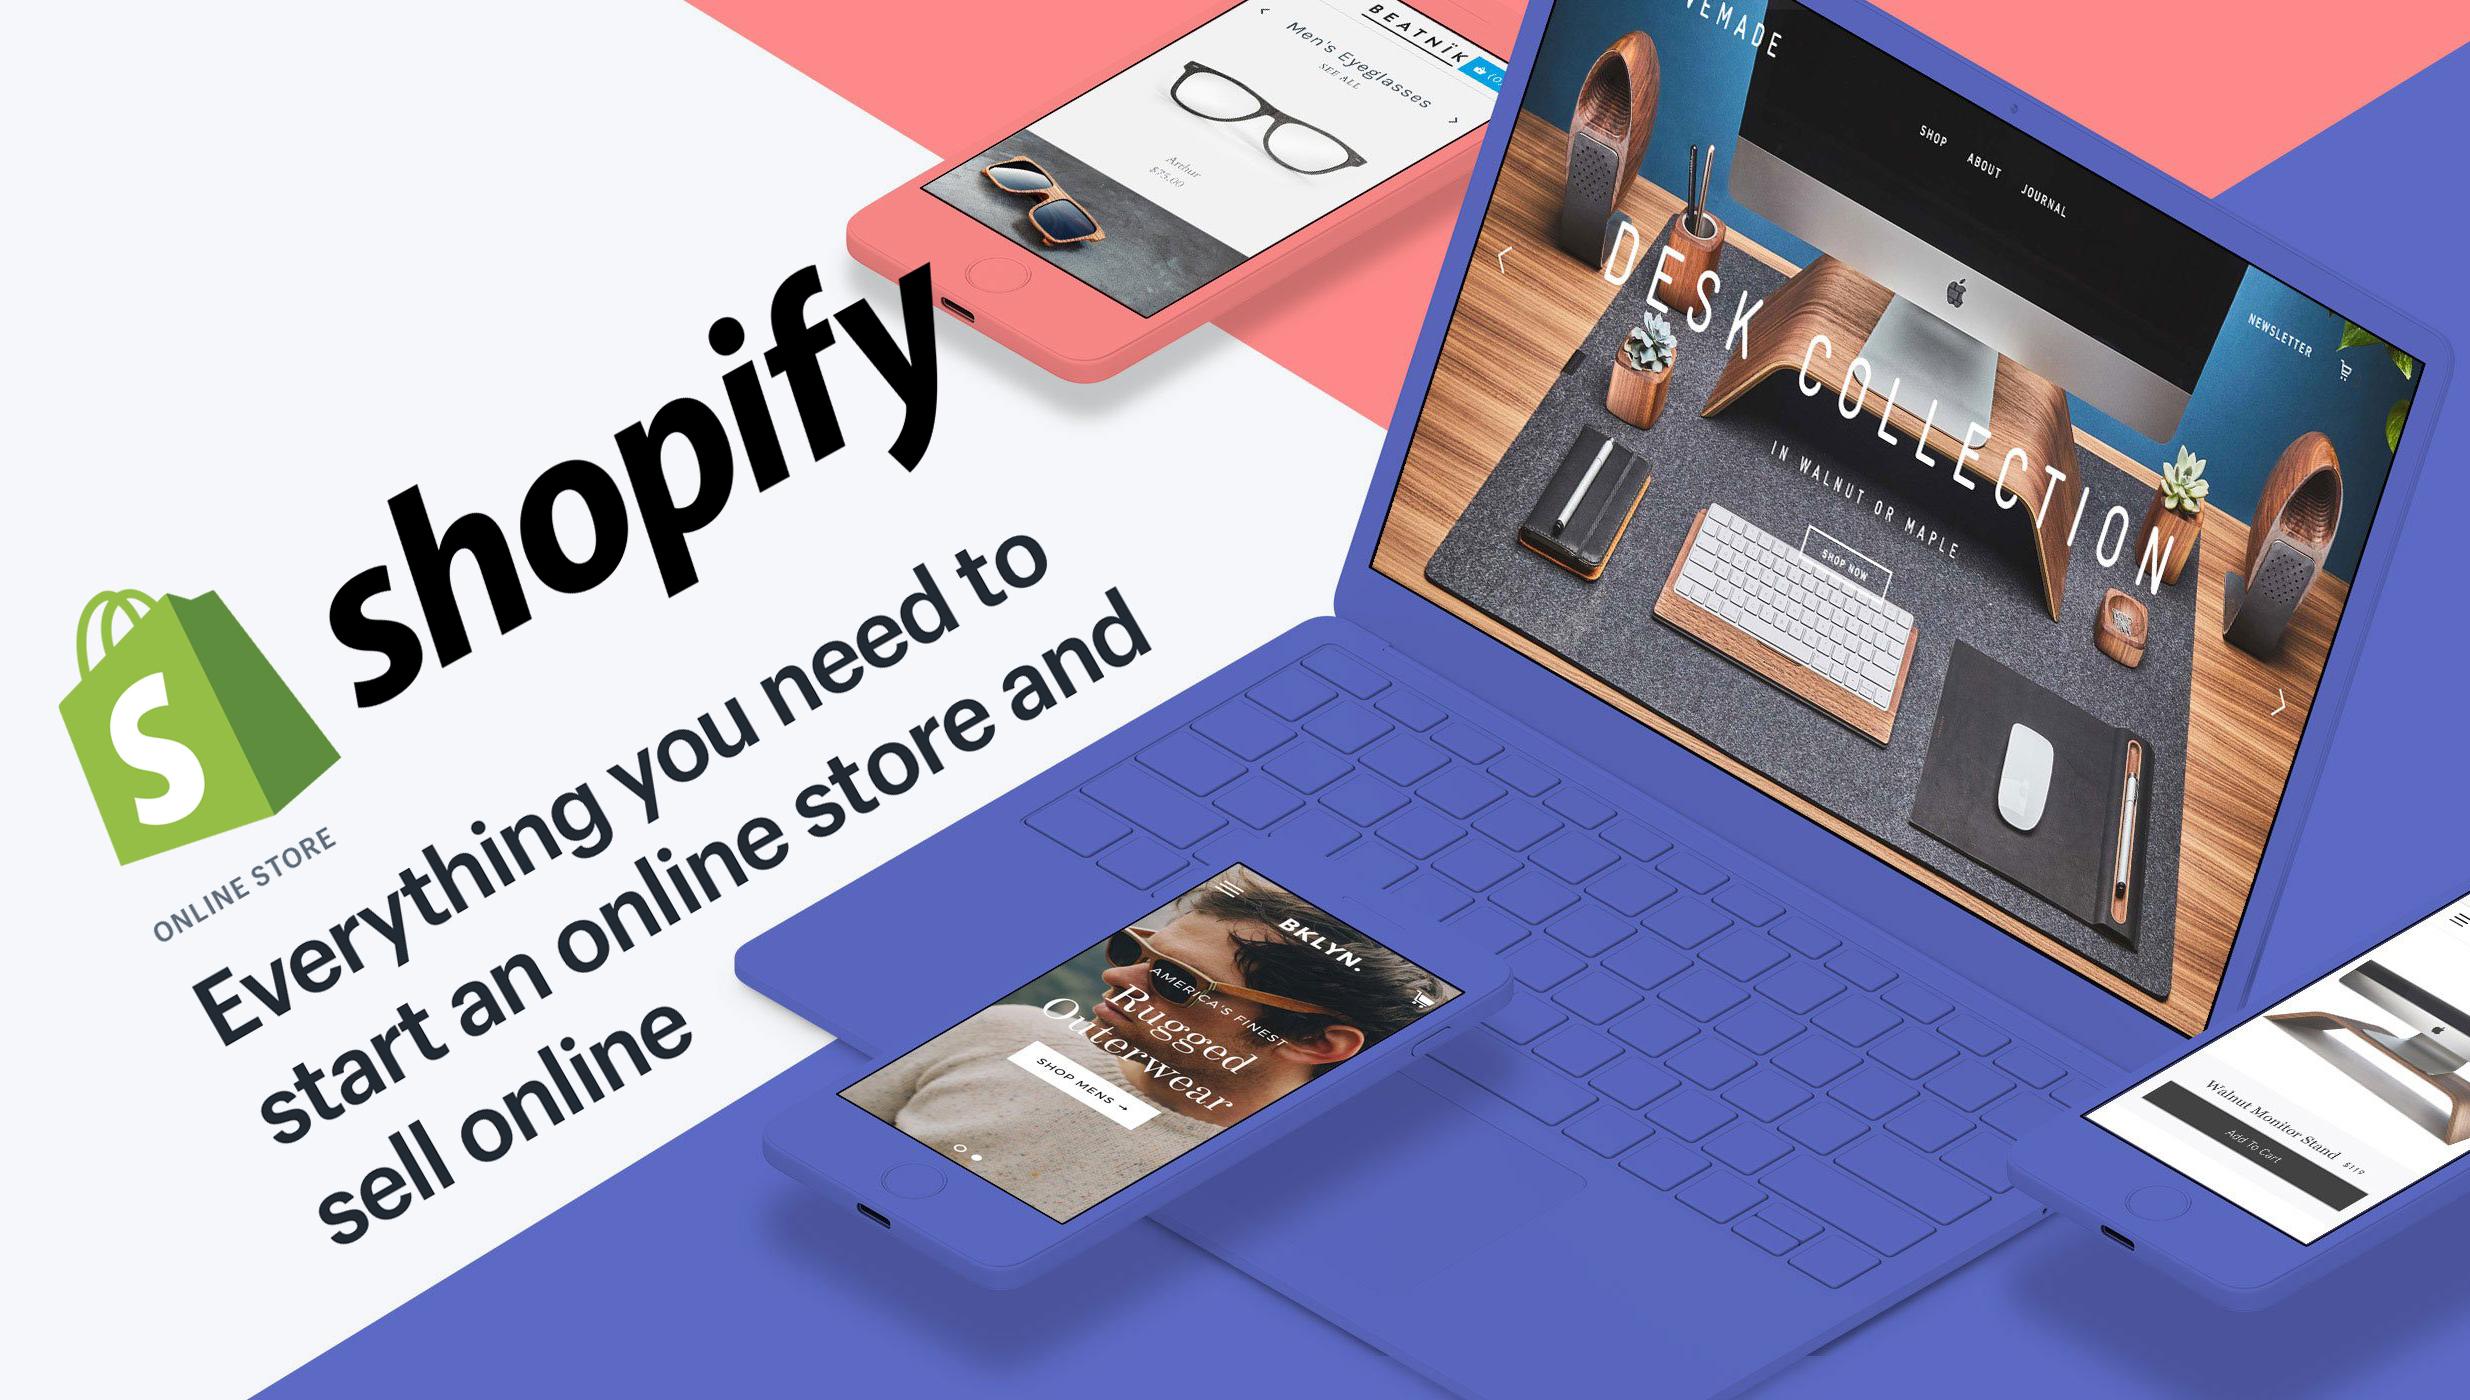 shopify_1.jpg